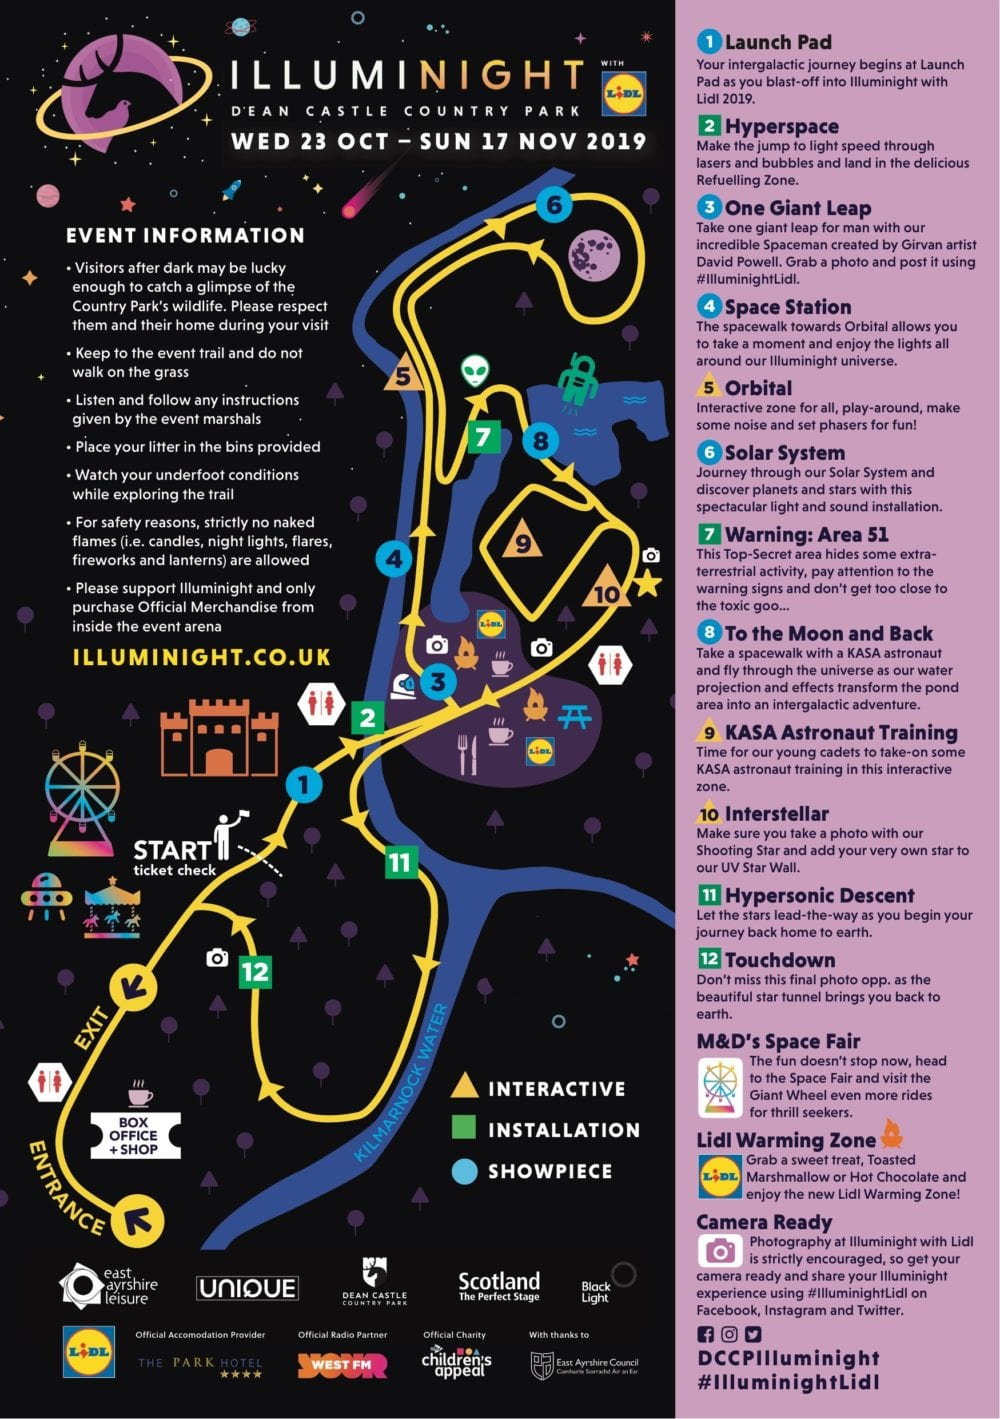 2019 illuminight with lidl dean castle kilmarnock map